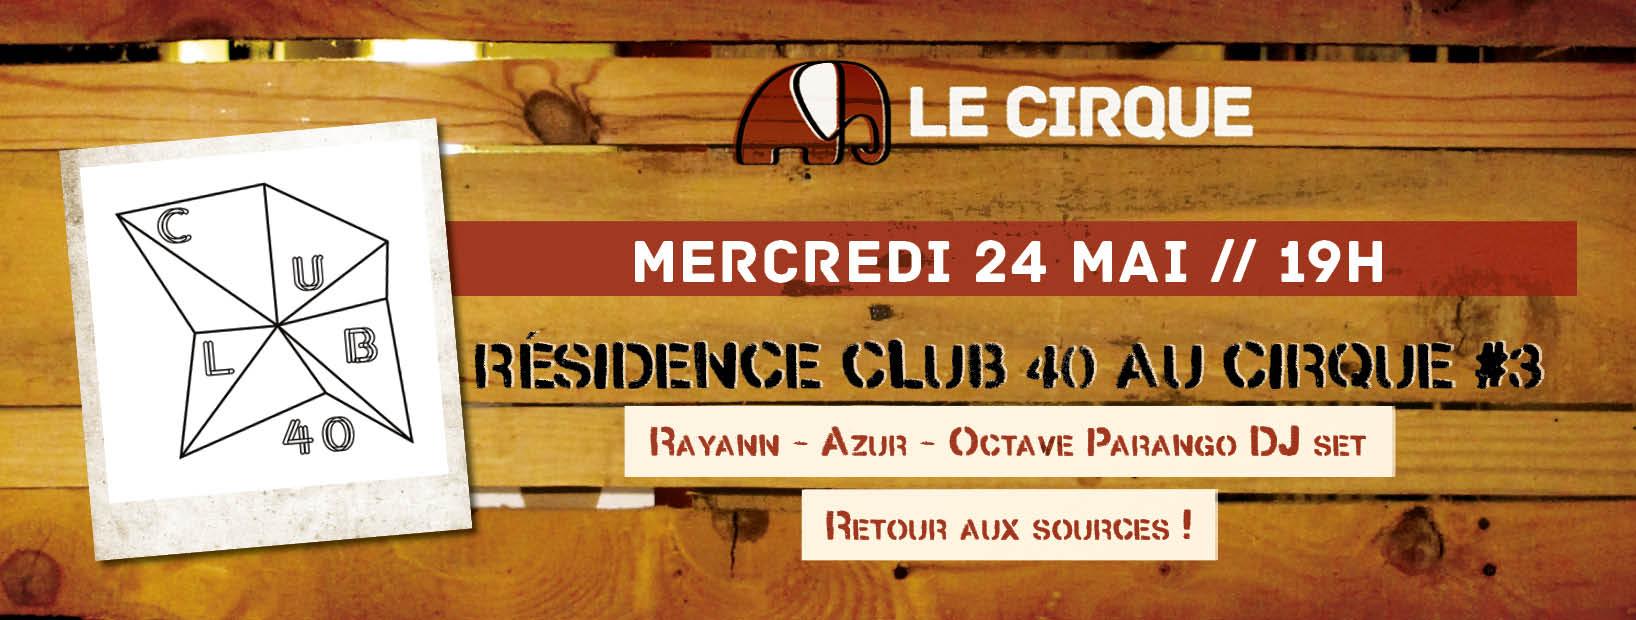 Résidence club 40 au Cirque #3 : Rayann + Azur + Octave Parango